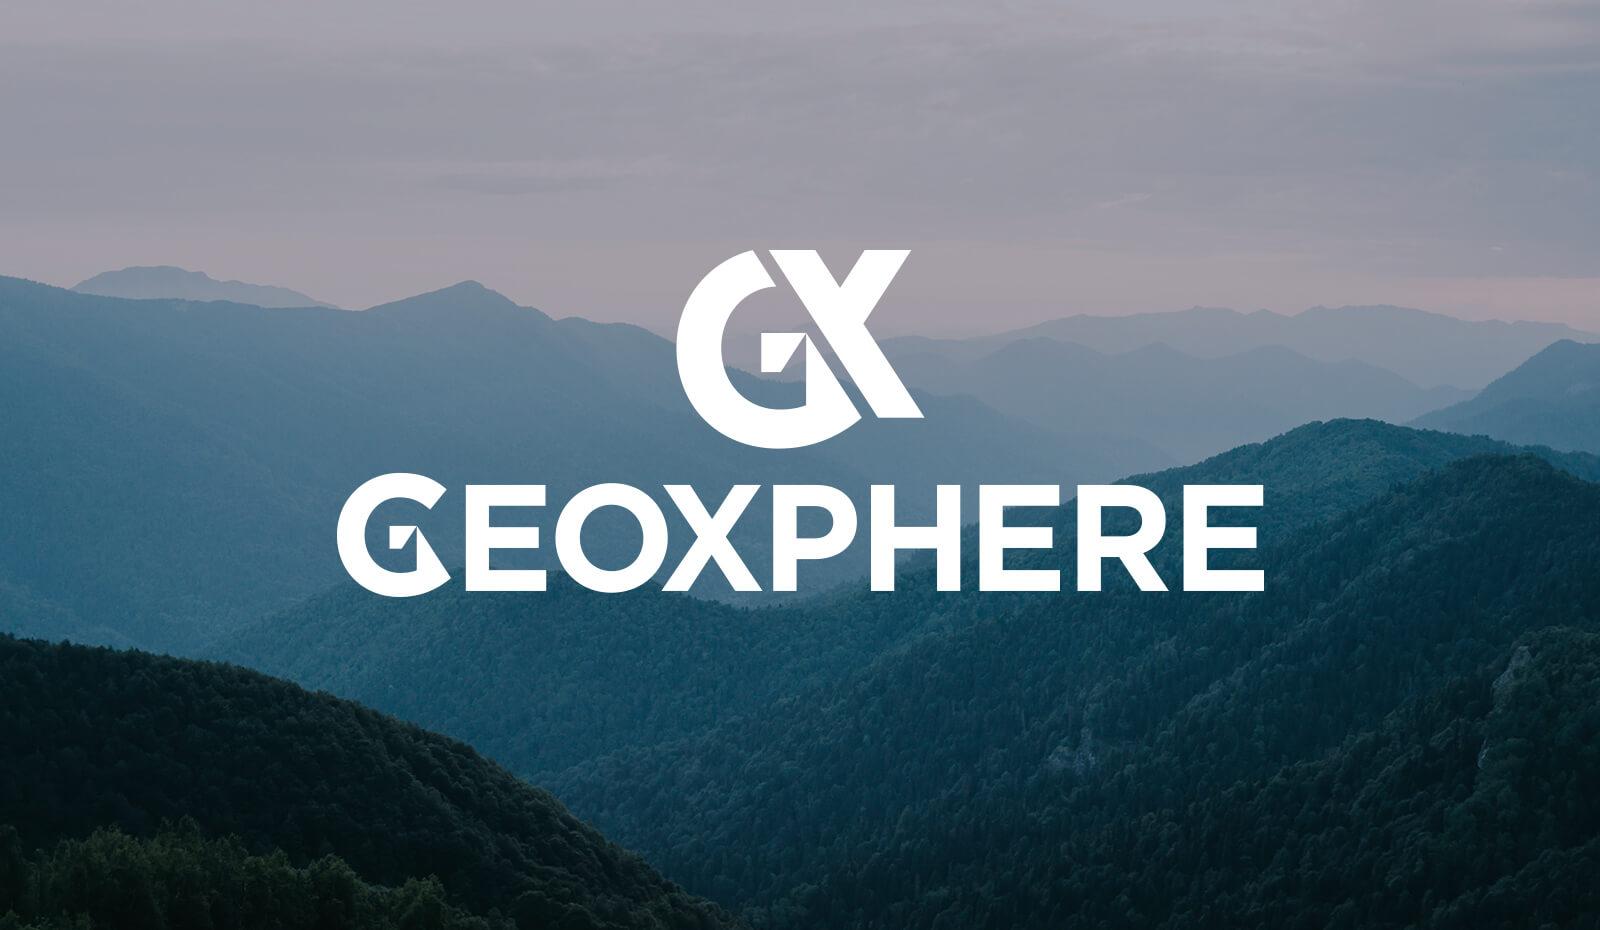 gx-logo-copy